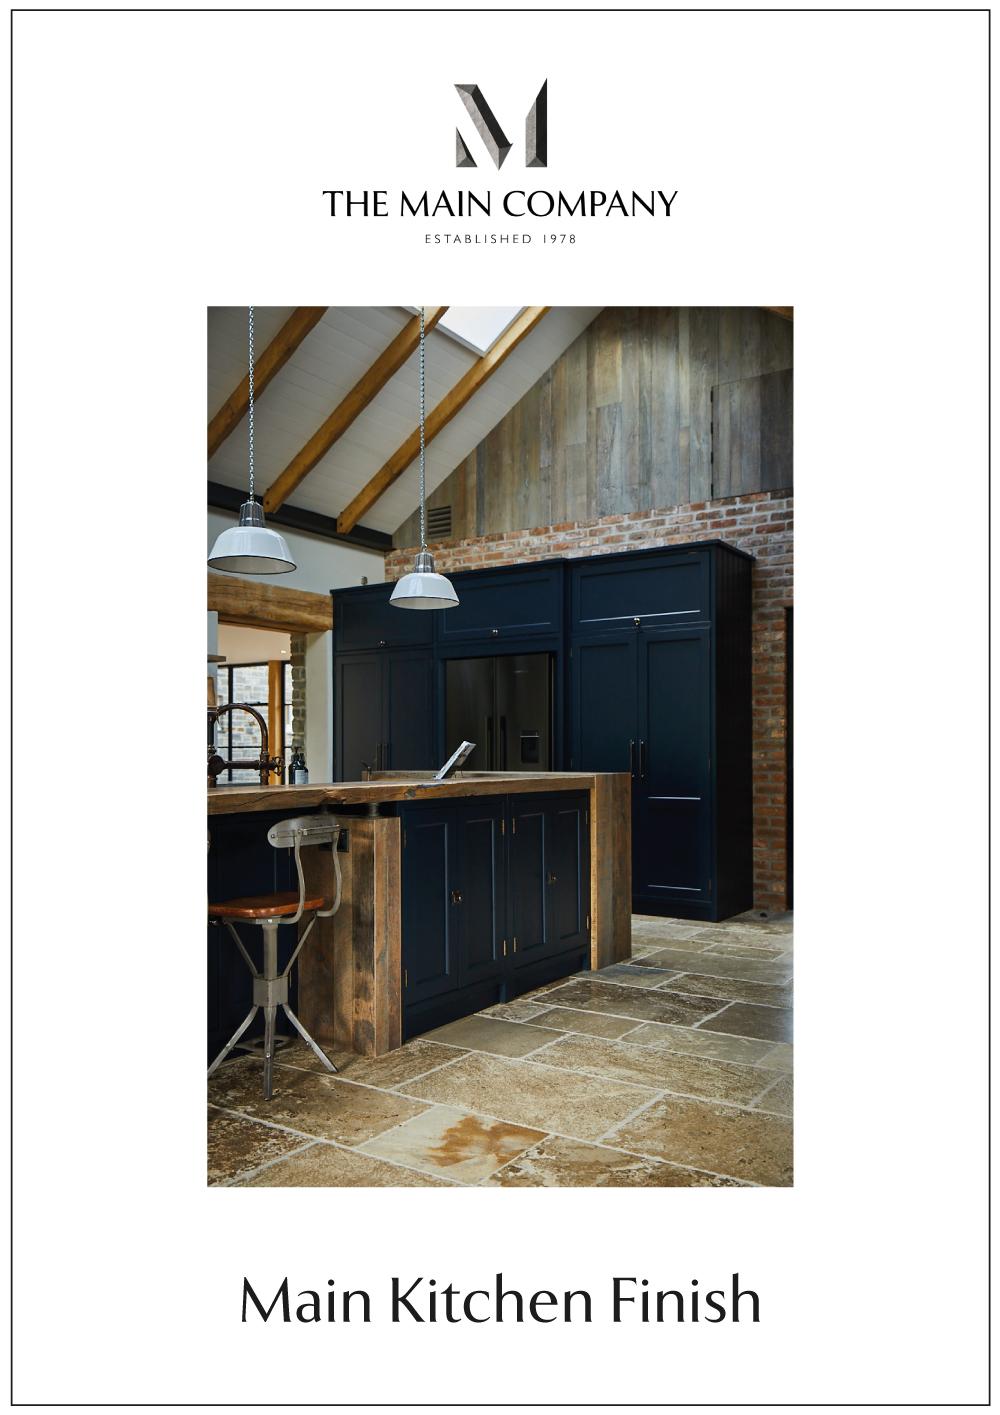 Main Kitchen Finish Brochure